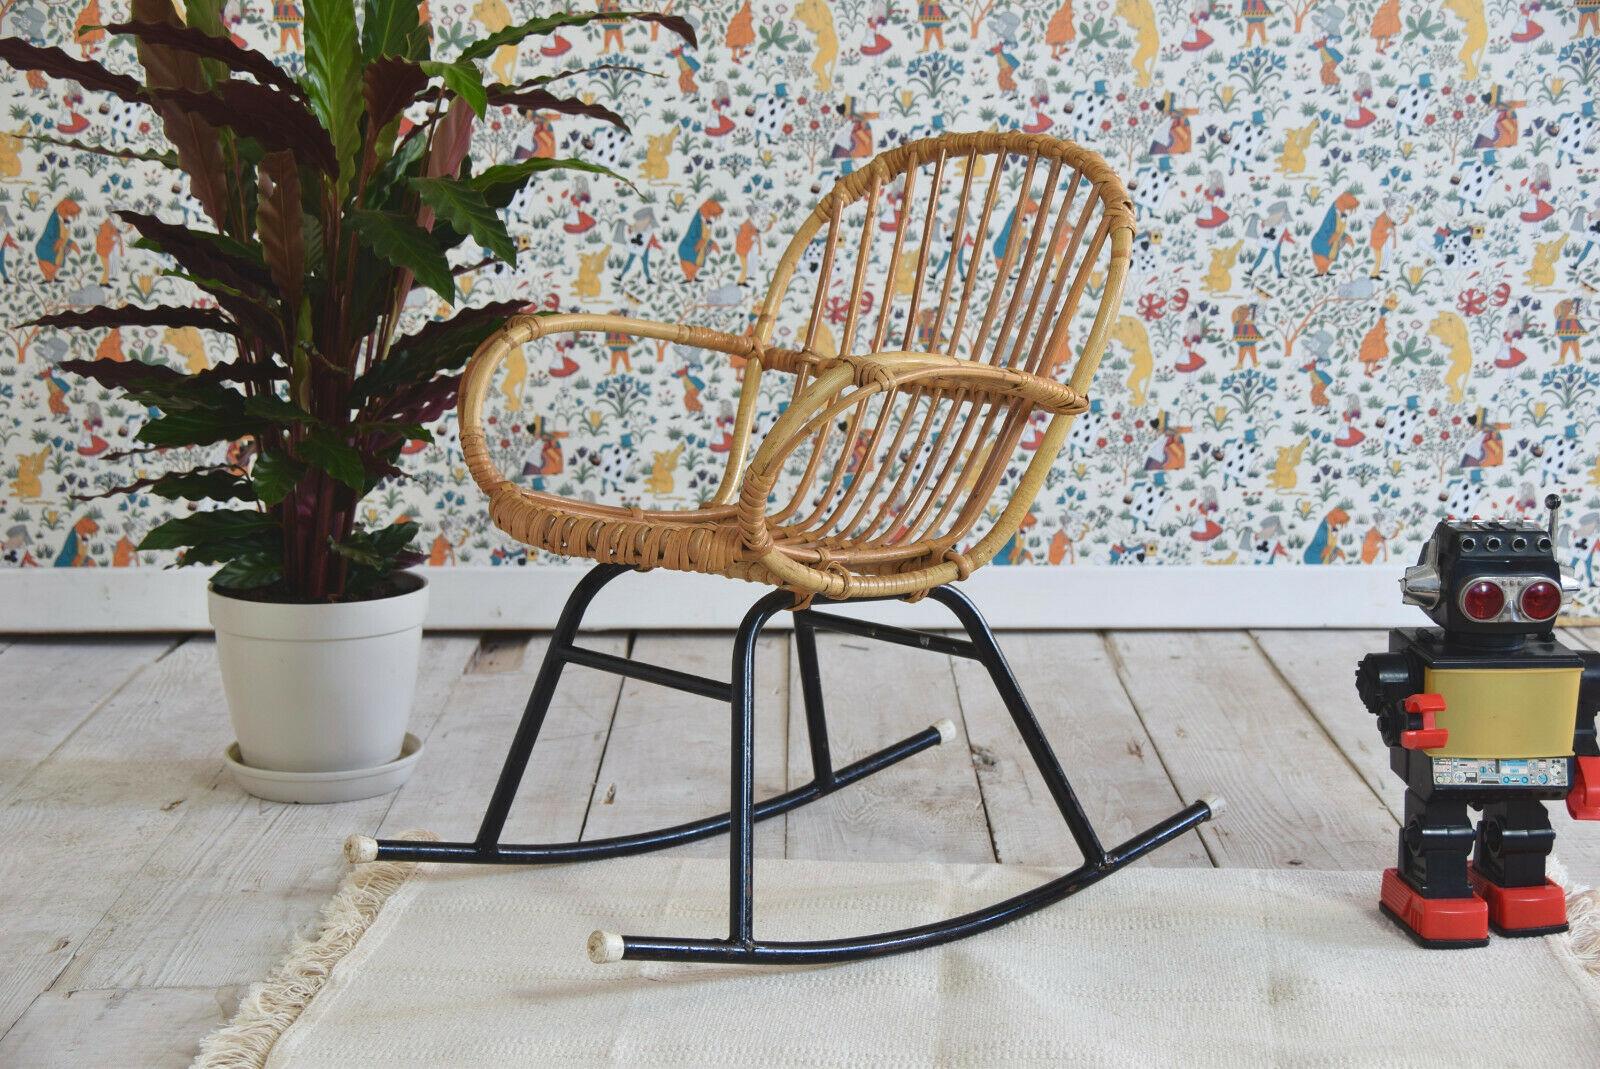 Vintage Childs Bamboo Cane Wicker Rocking Chair Children S Kids Furniture